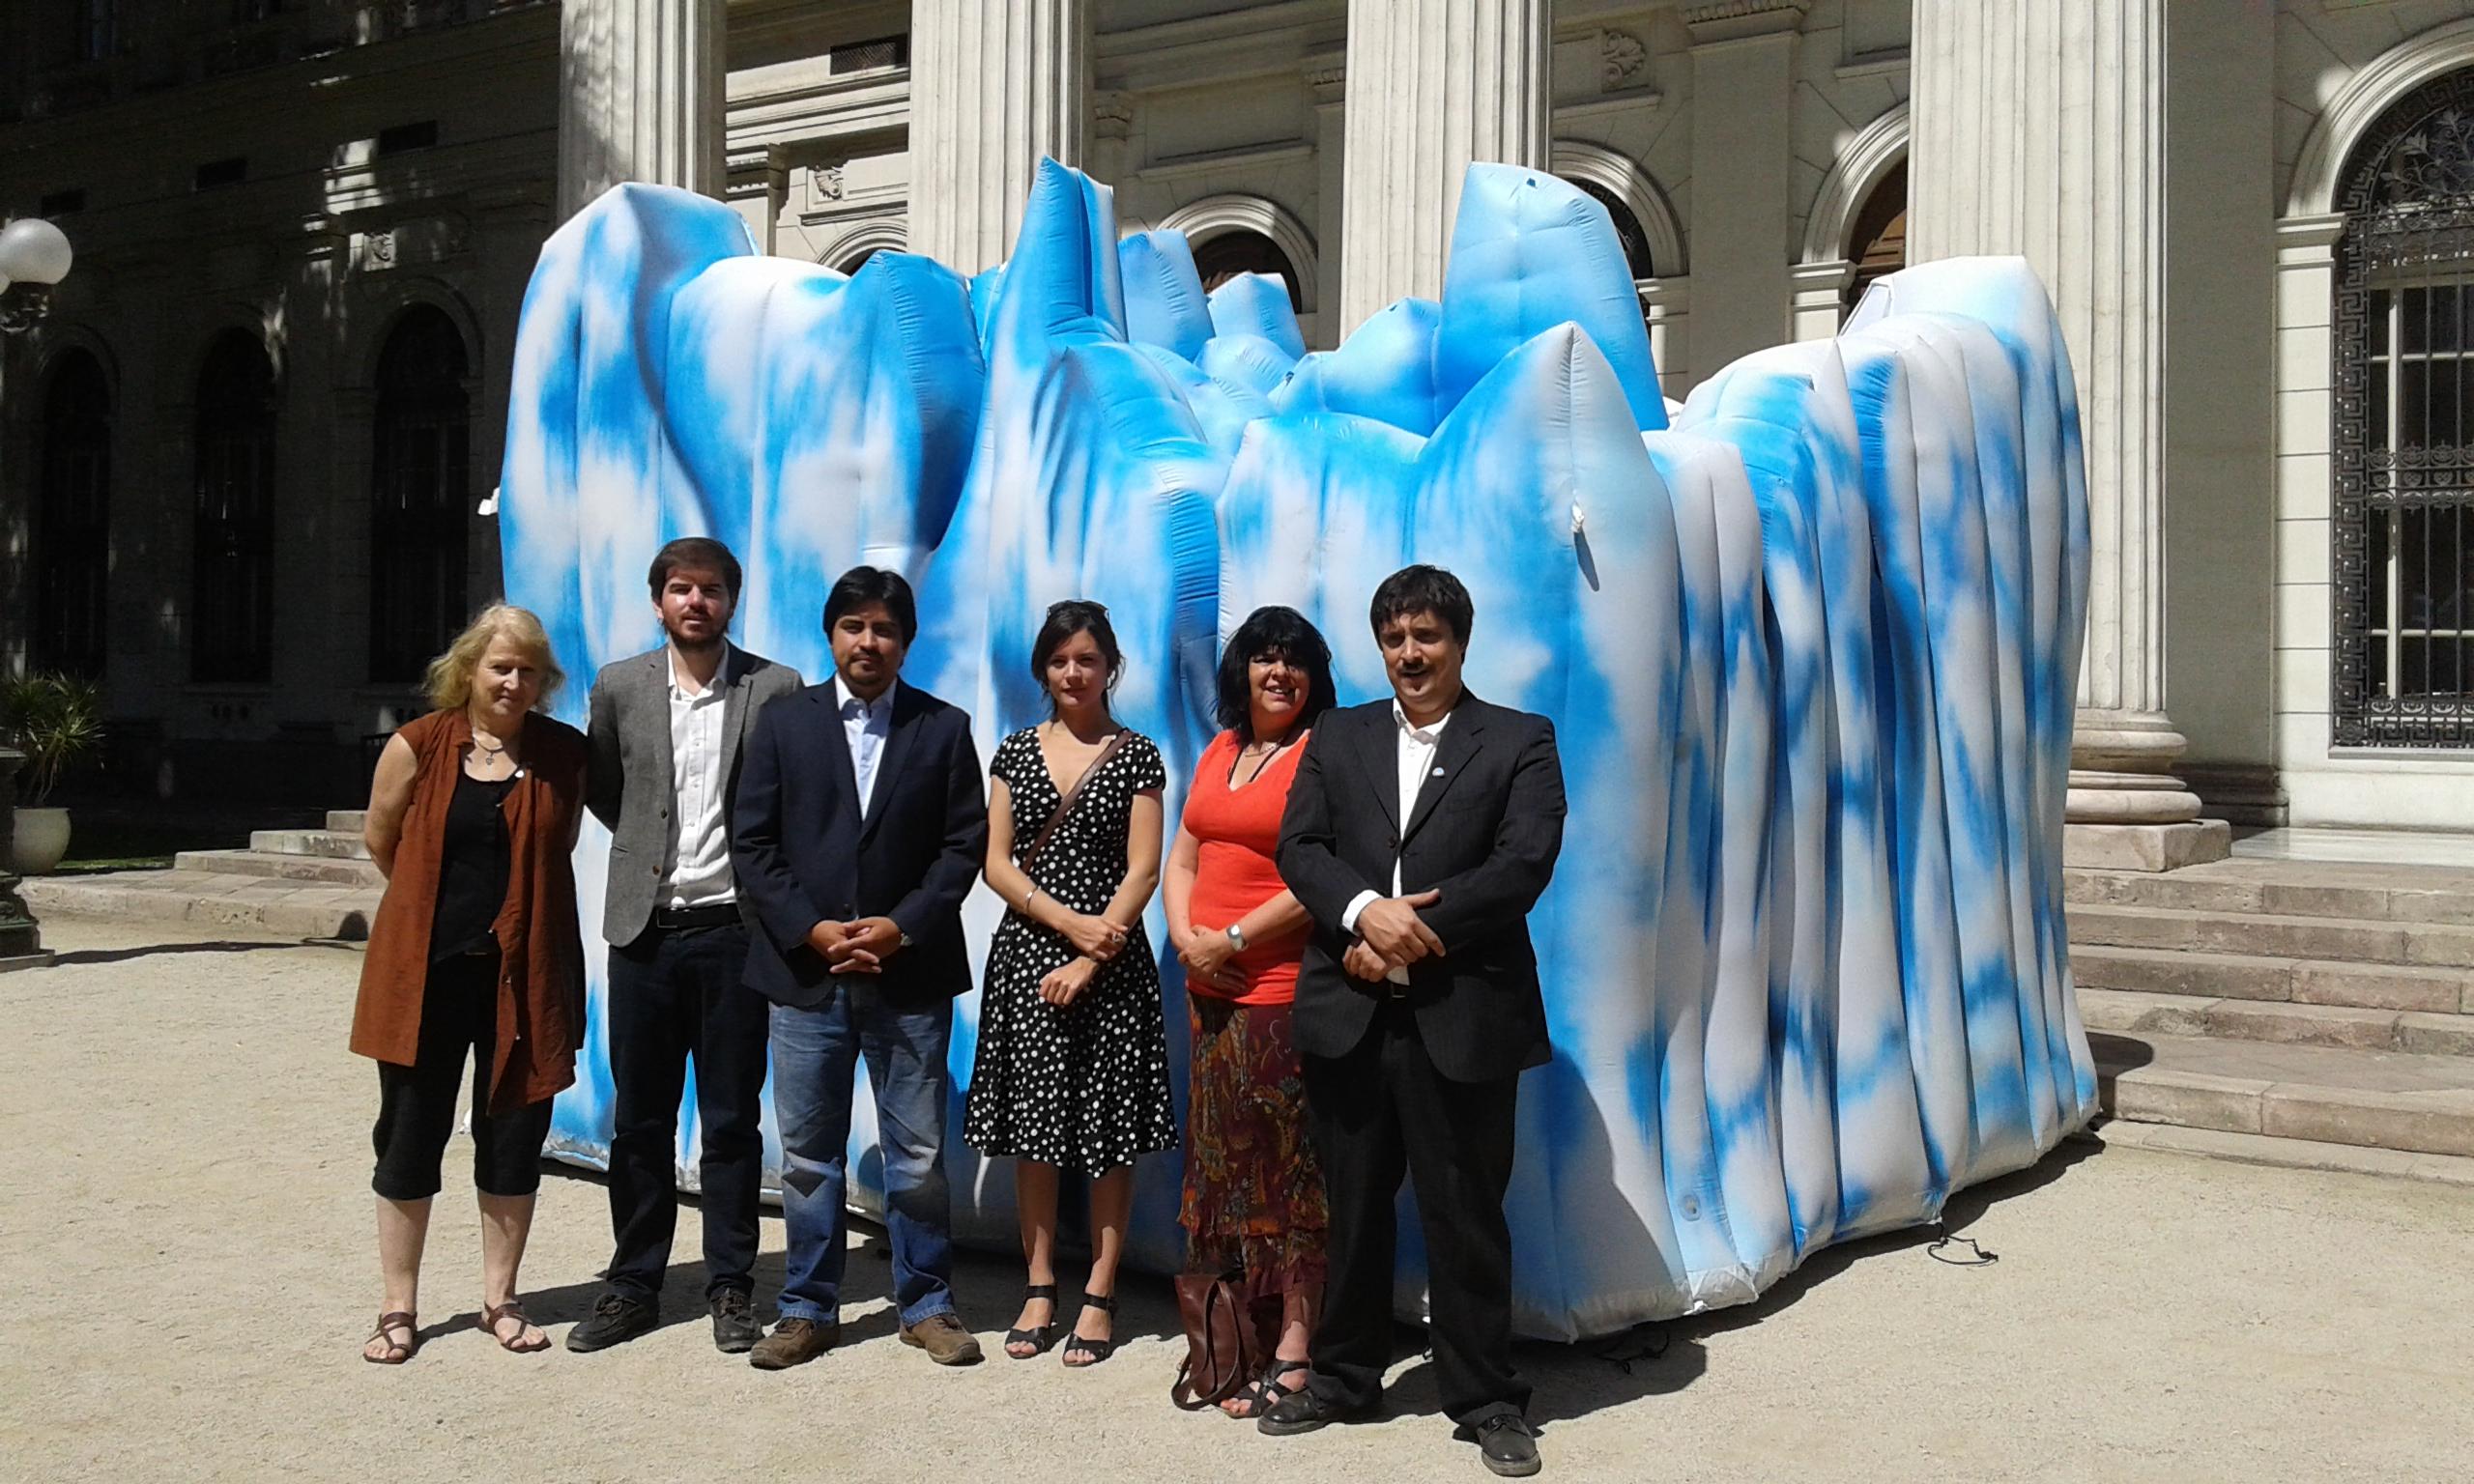 Bancada Glaciar urge a Bachelet ante demora en proyecto de Ley de Protección de Glaciares